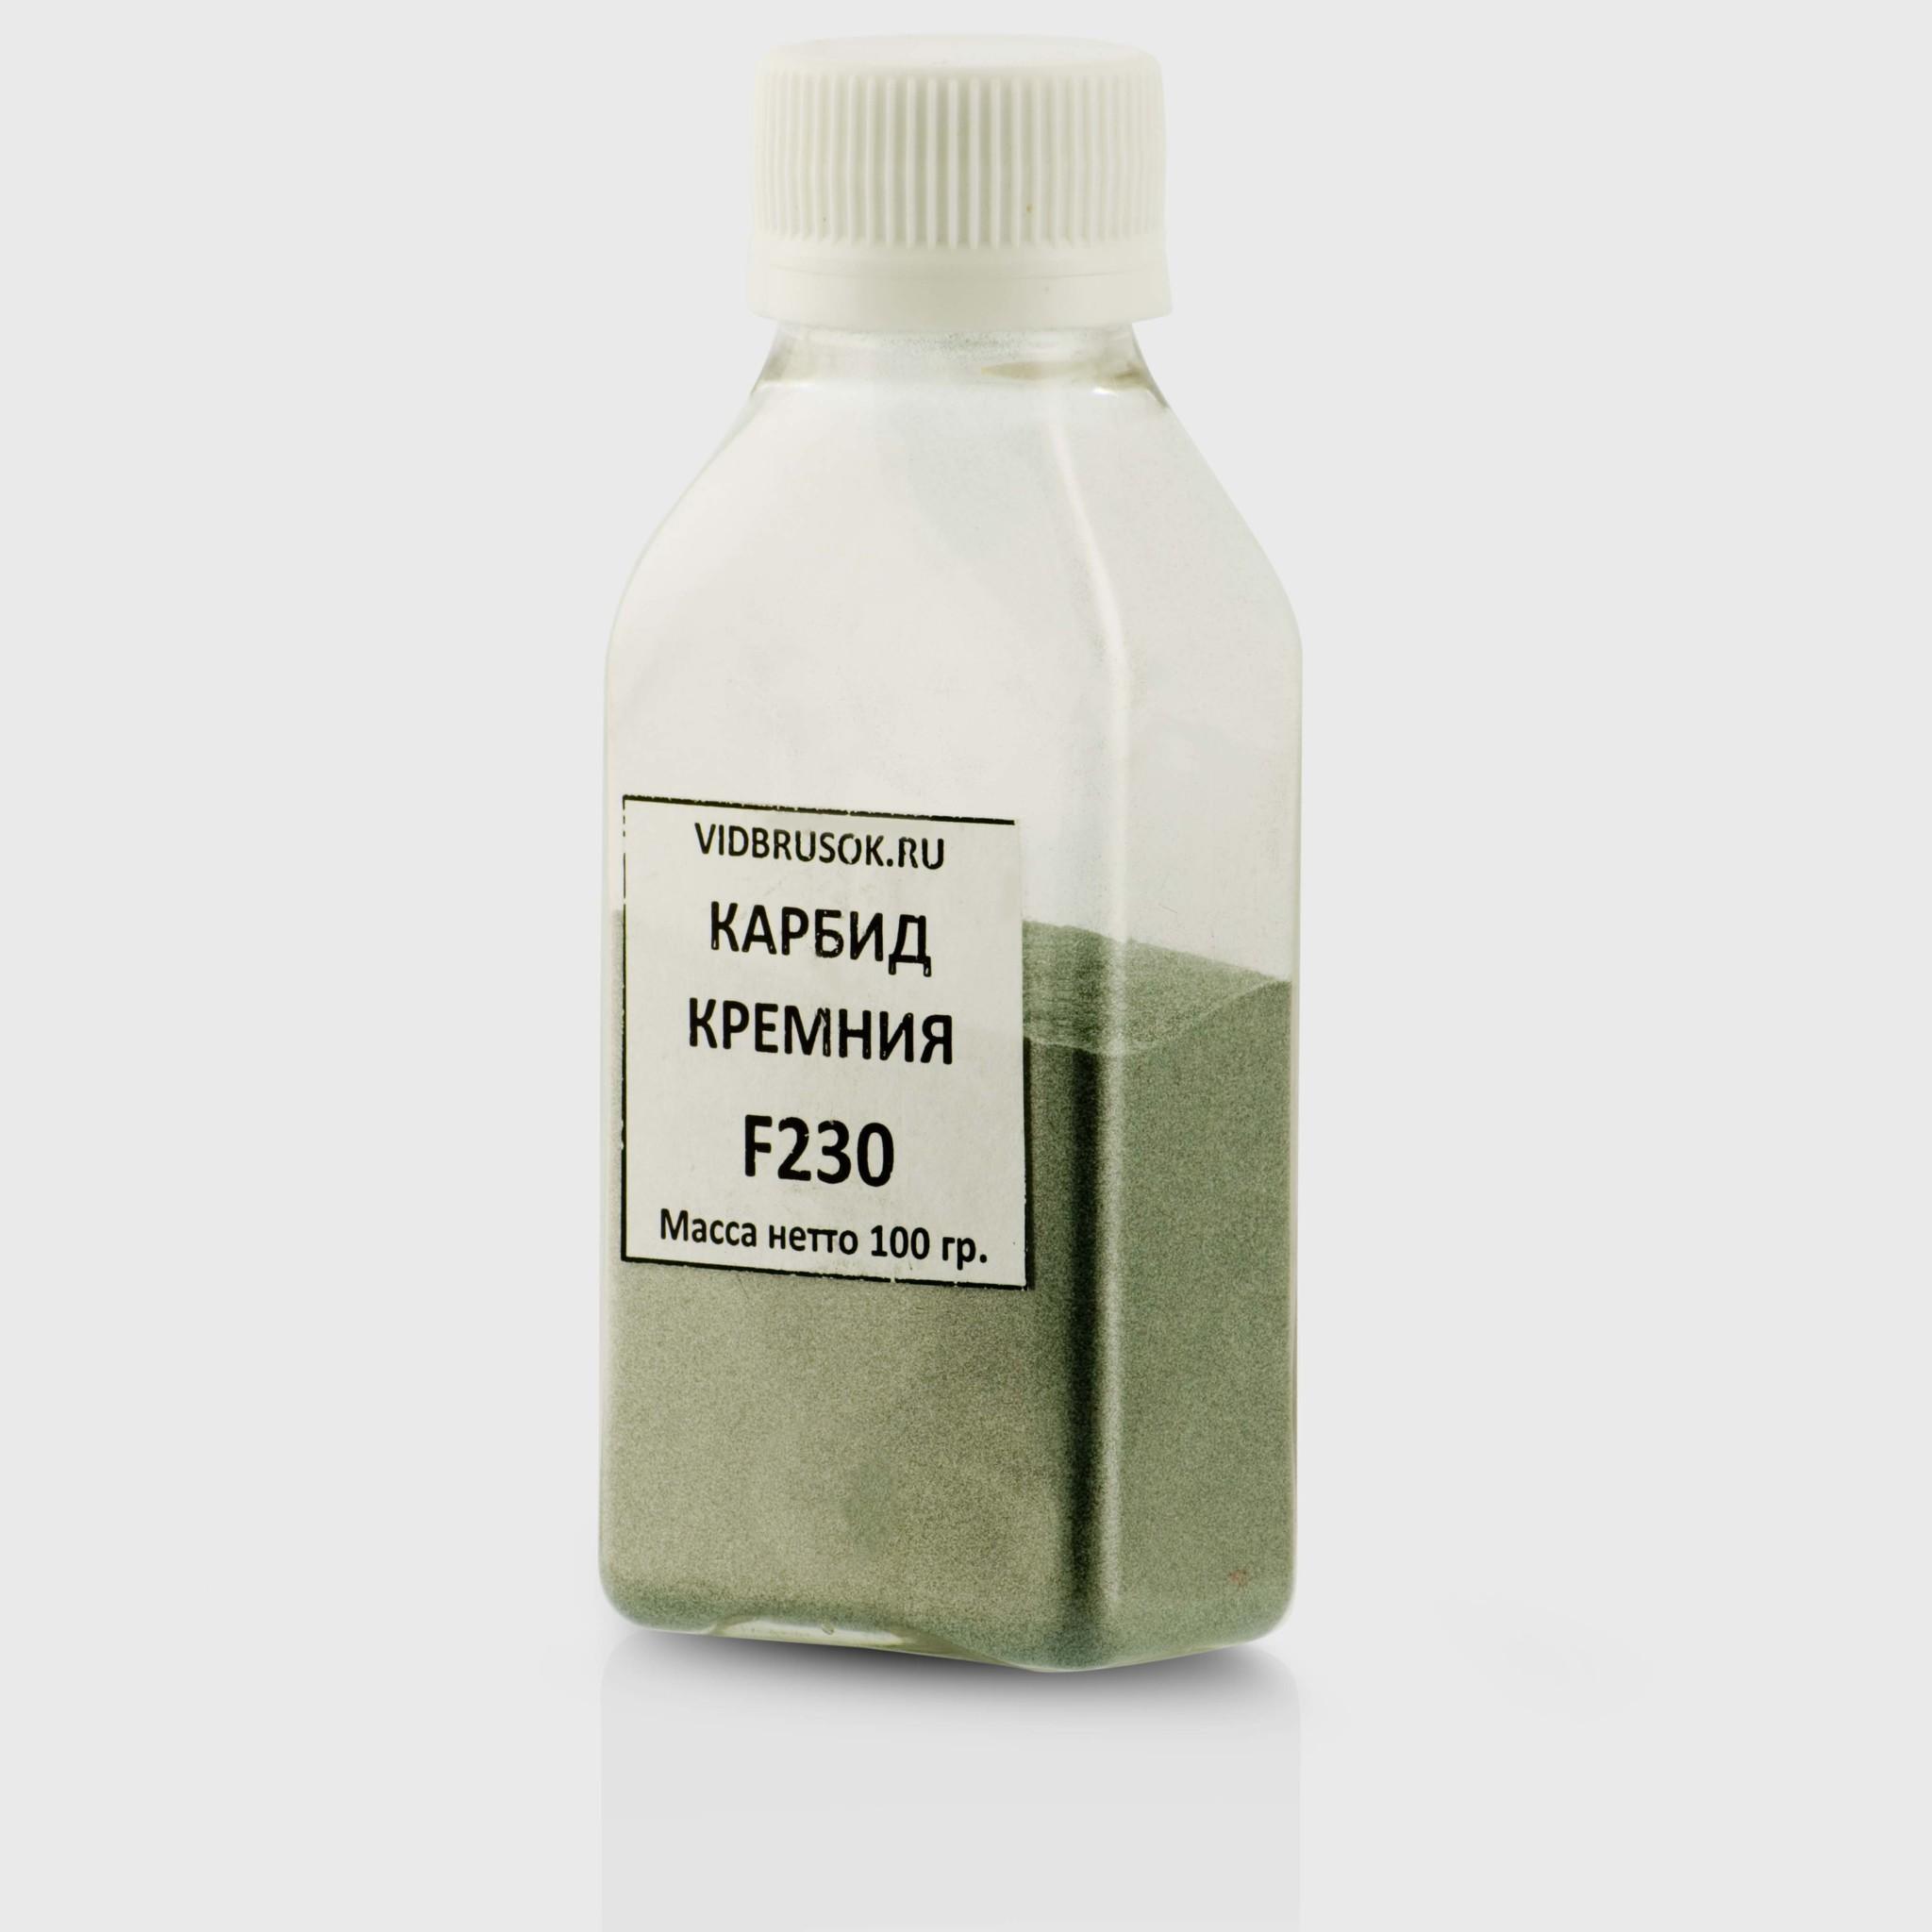 Каталог Карбид кремния F230 100 гр. IMGP2803_copy.jpg